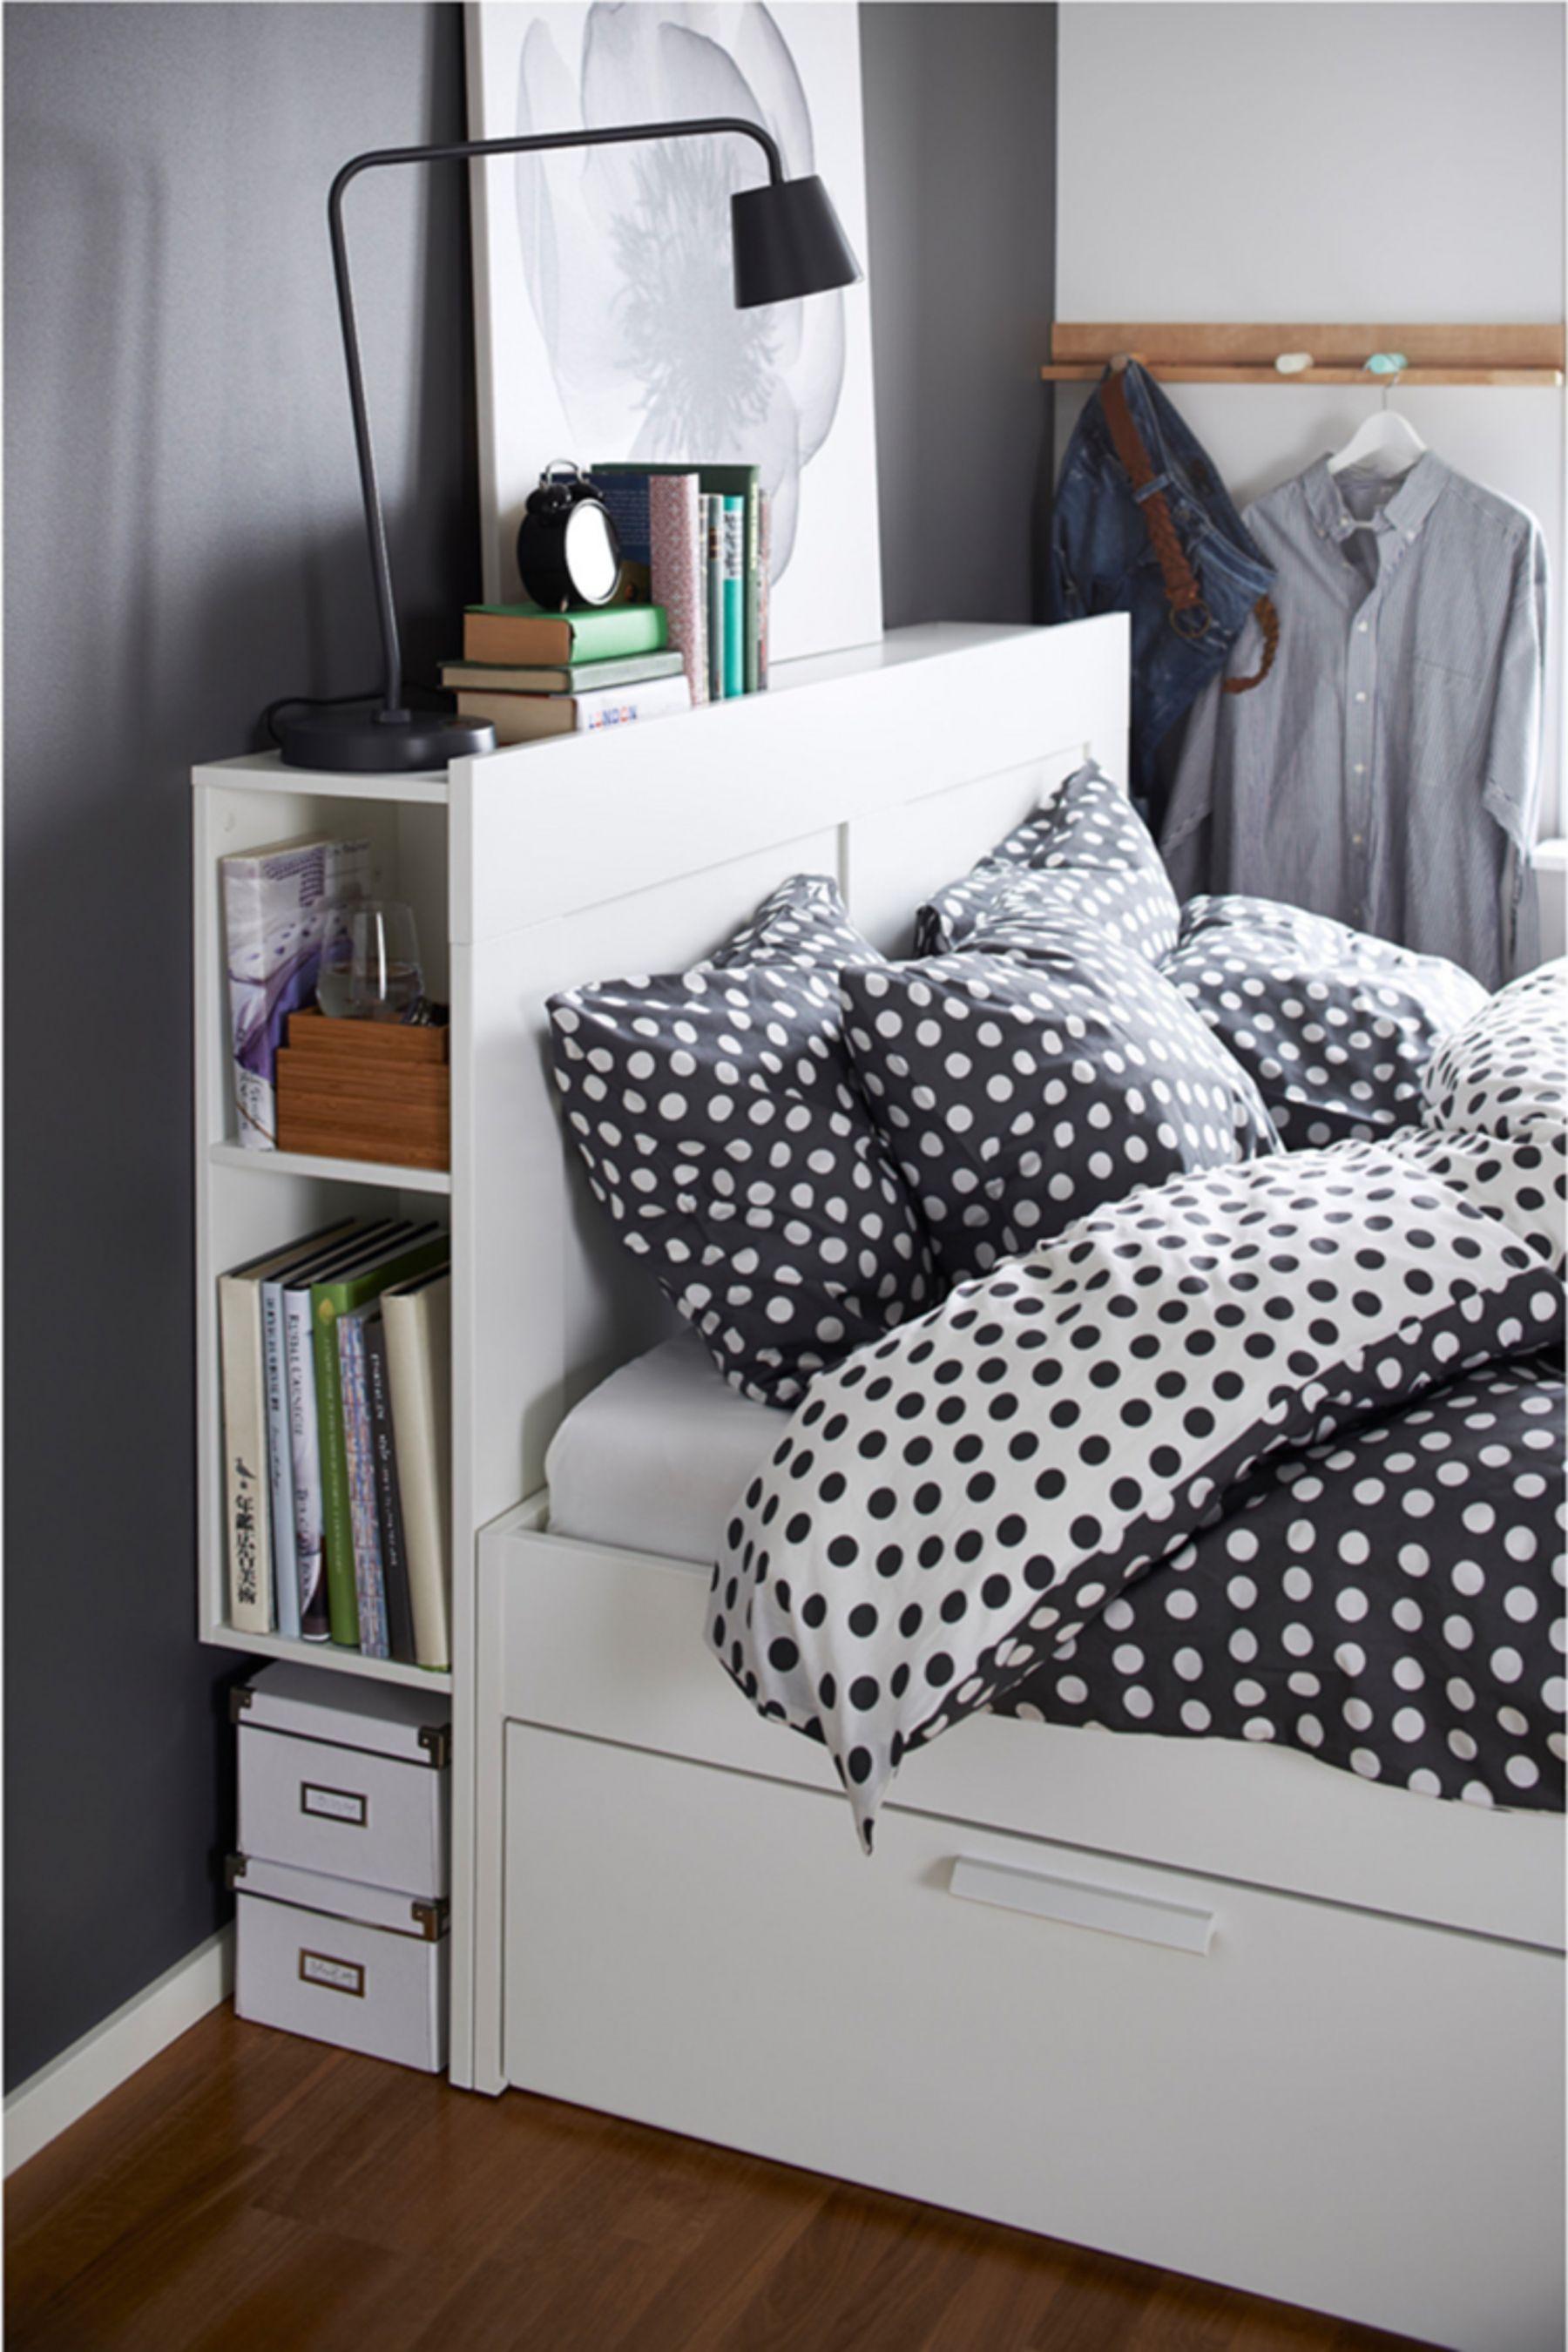 15 Creative Bedroom Storage Design Ideas Bed Frame With Storage